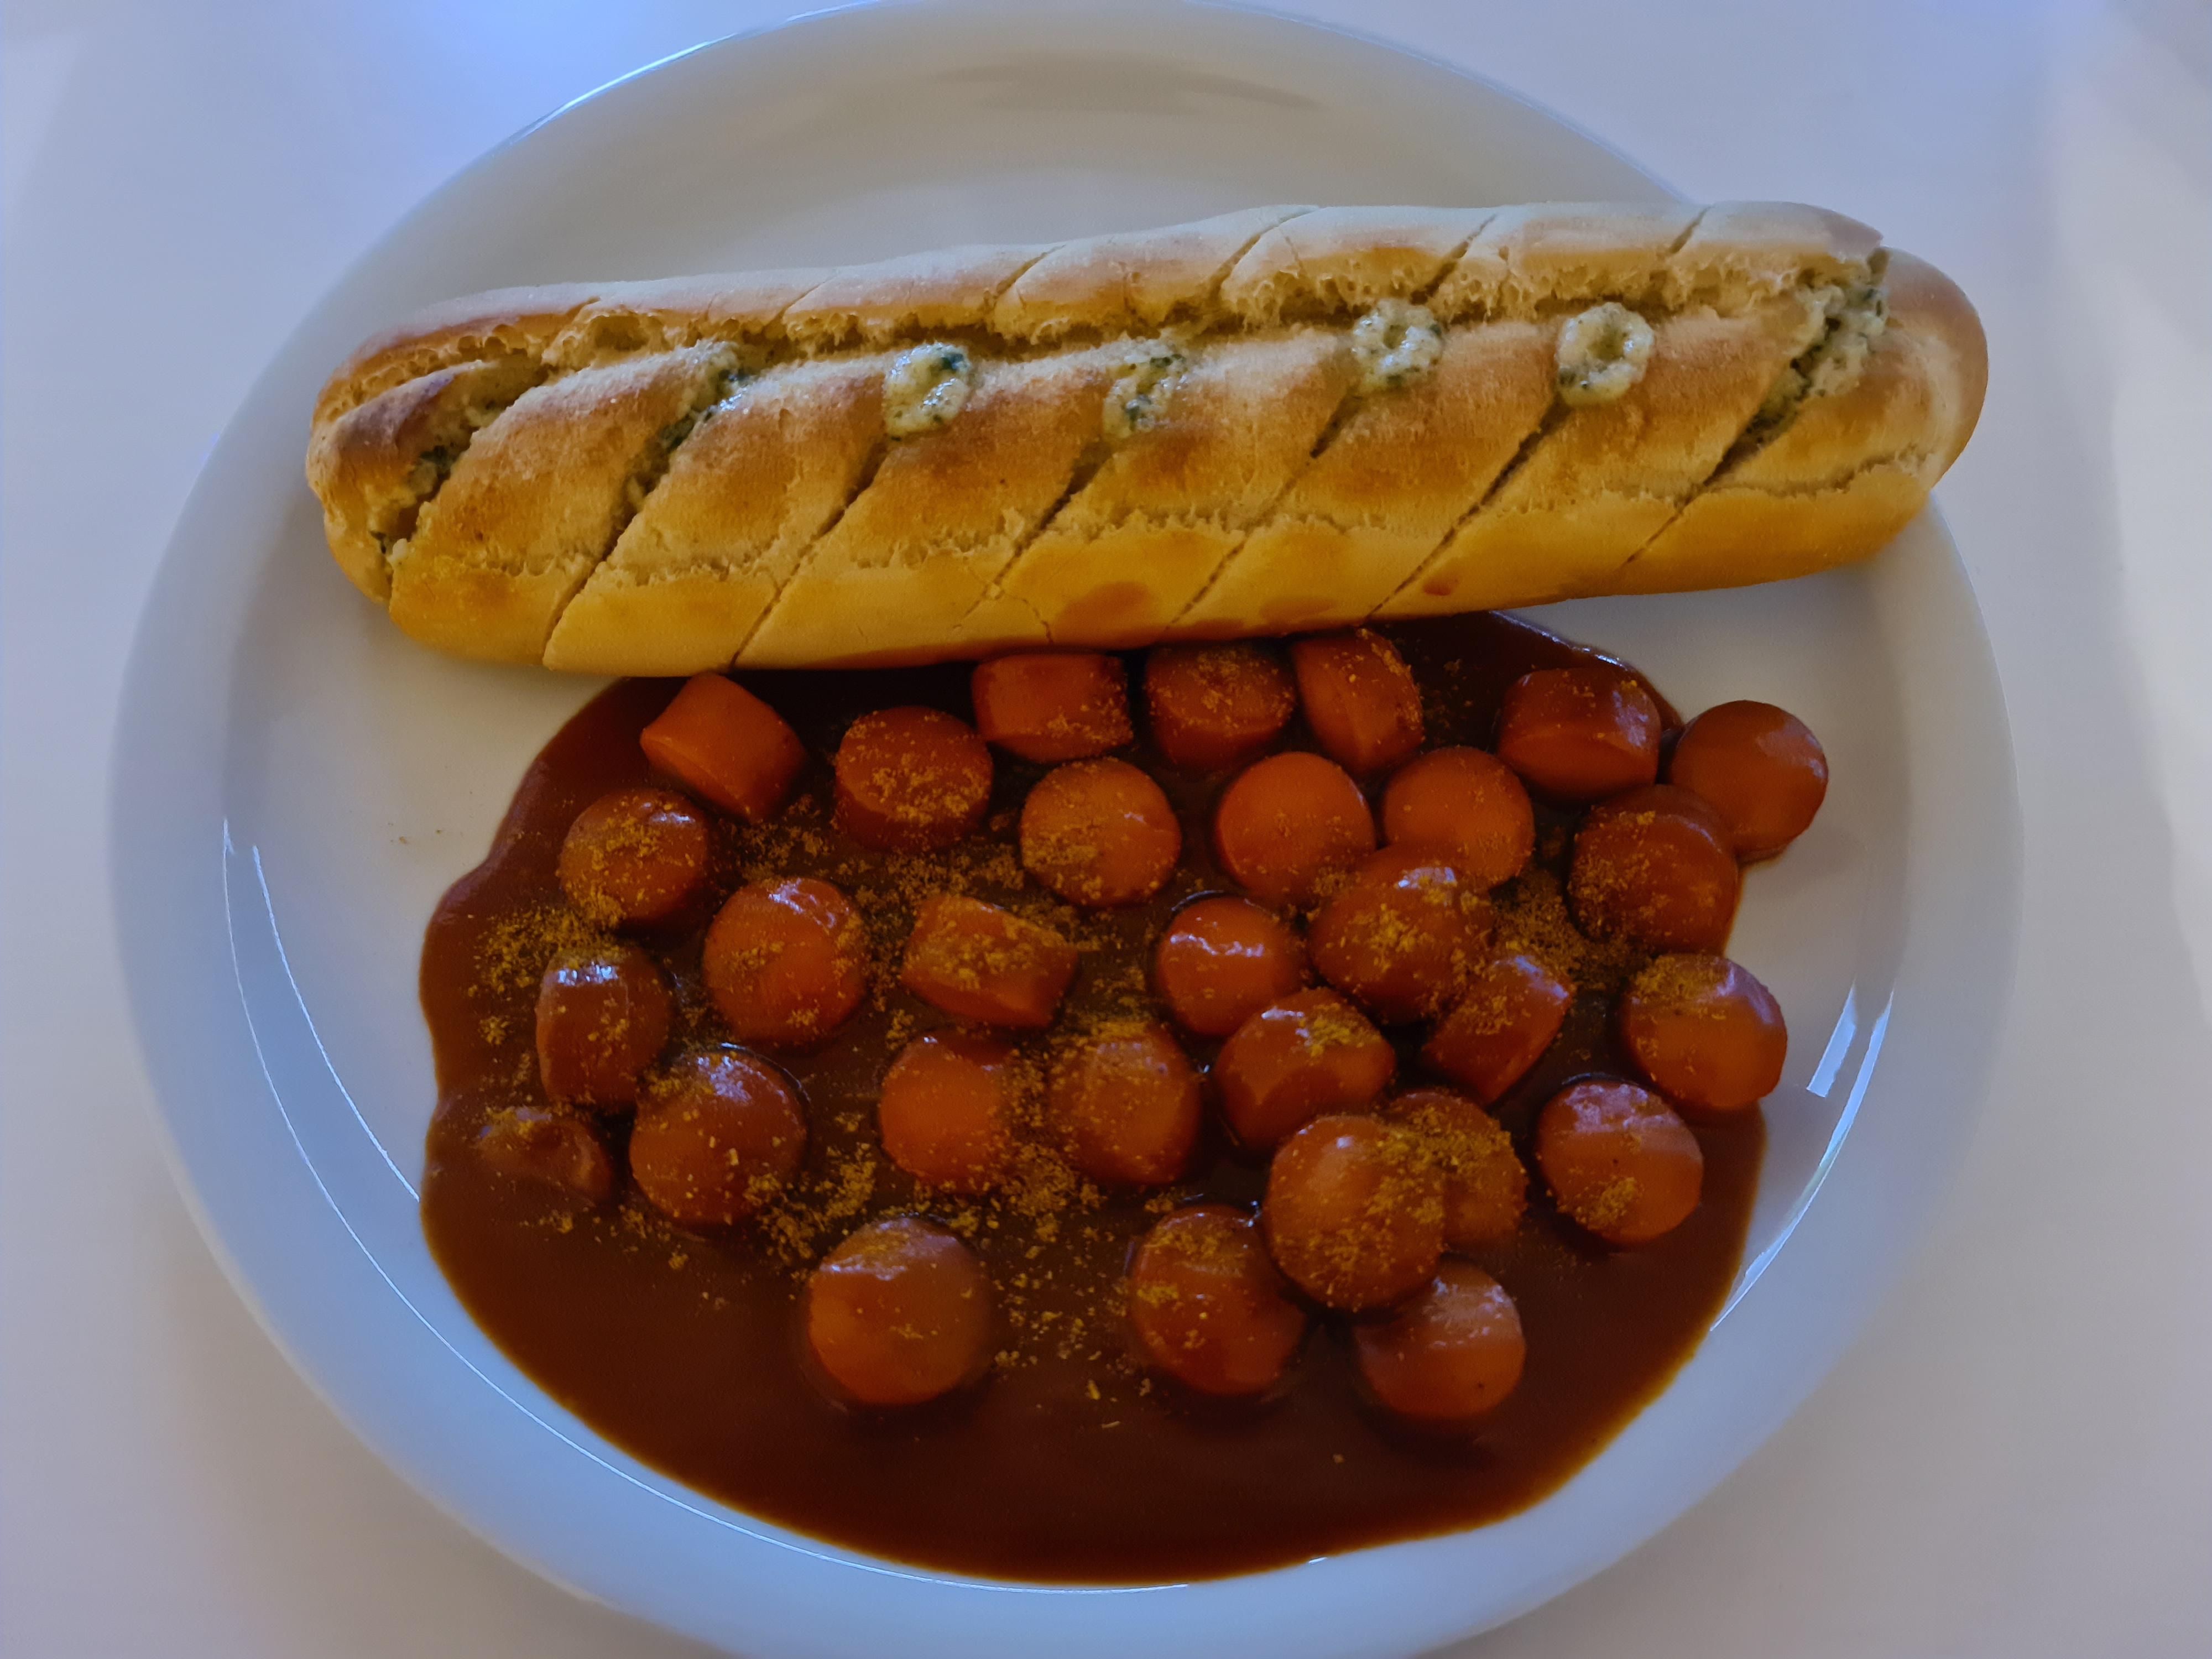 https://foodloader.net/Holz_2020-03-28_Curryking_und_Knoblauchbaguette.jpg